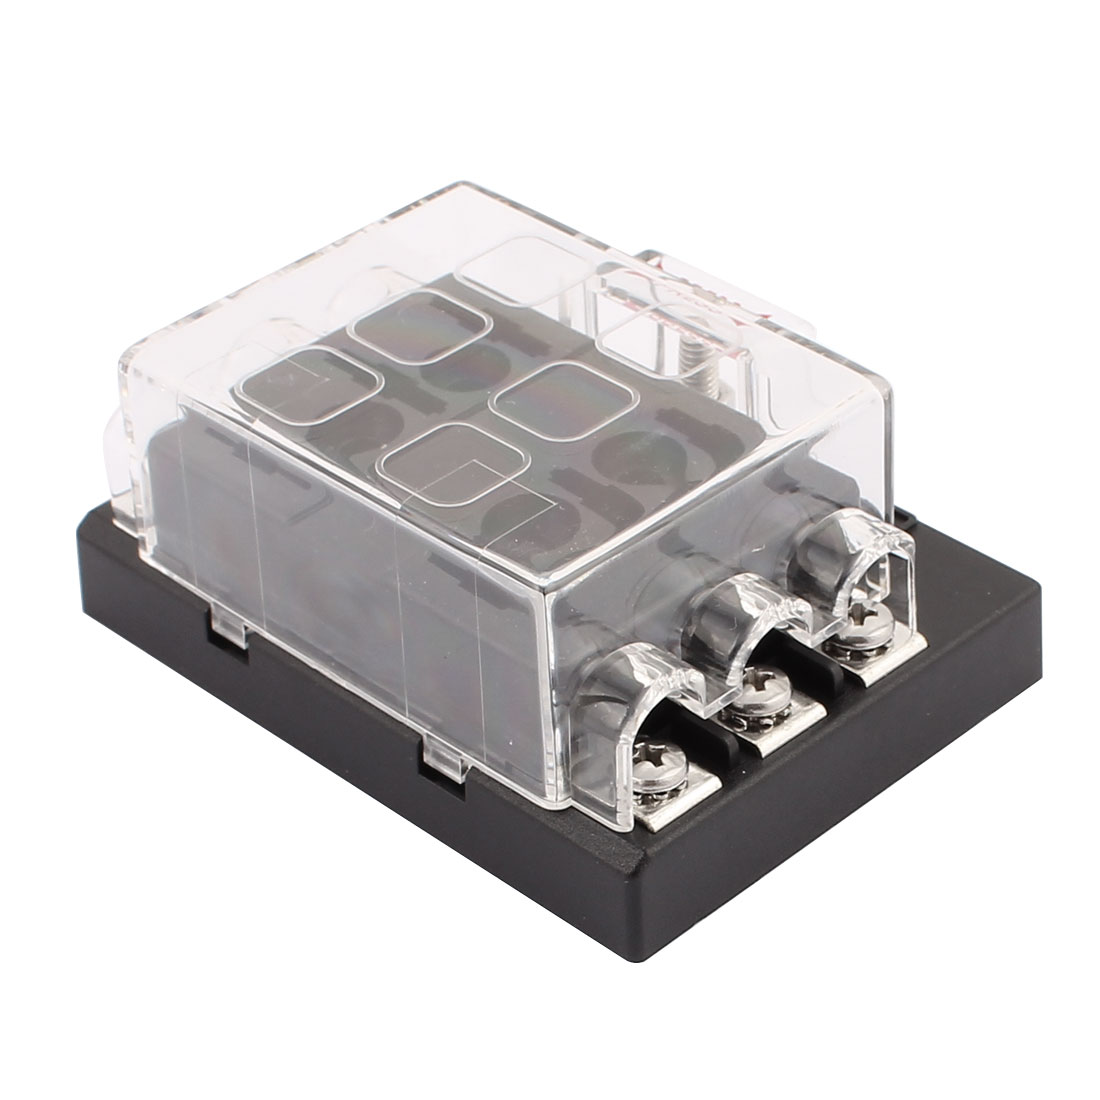 Fuse Box Terminal Adapter Electrical Wiring Diagrams Headphones Dc32v 6 Way Terminals Circuit Atc Ato Car Suv Auto Blade